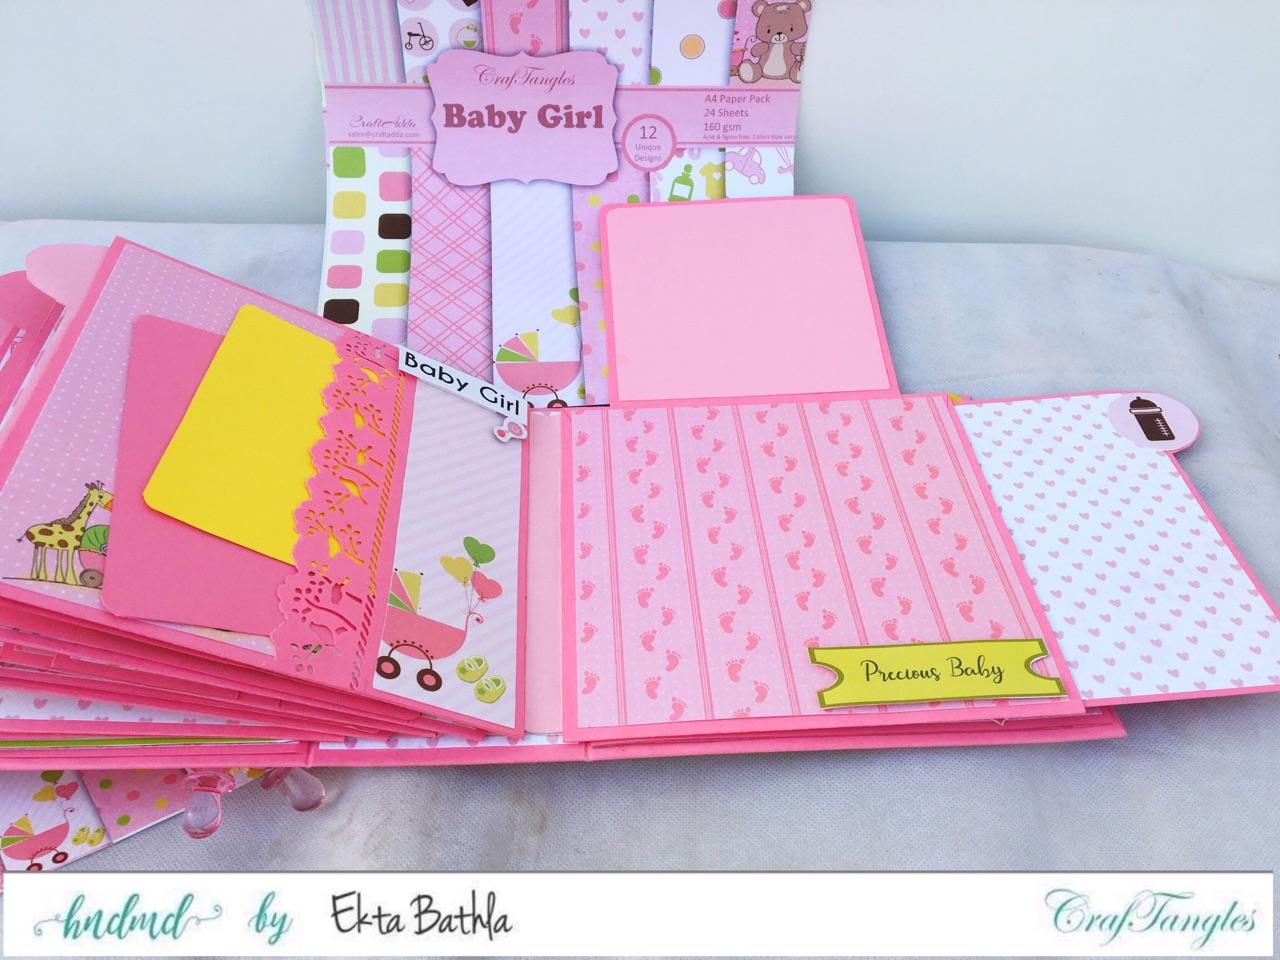 Baby Girl mini album showcasing Baby Girl Elements Pack by CrafTangles 12